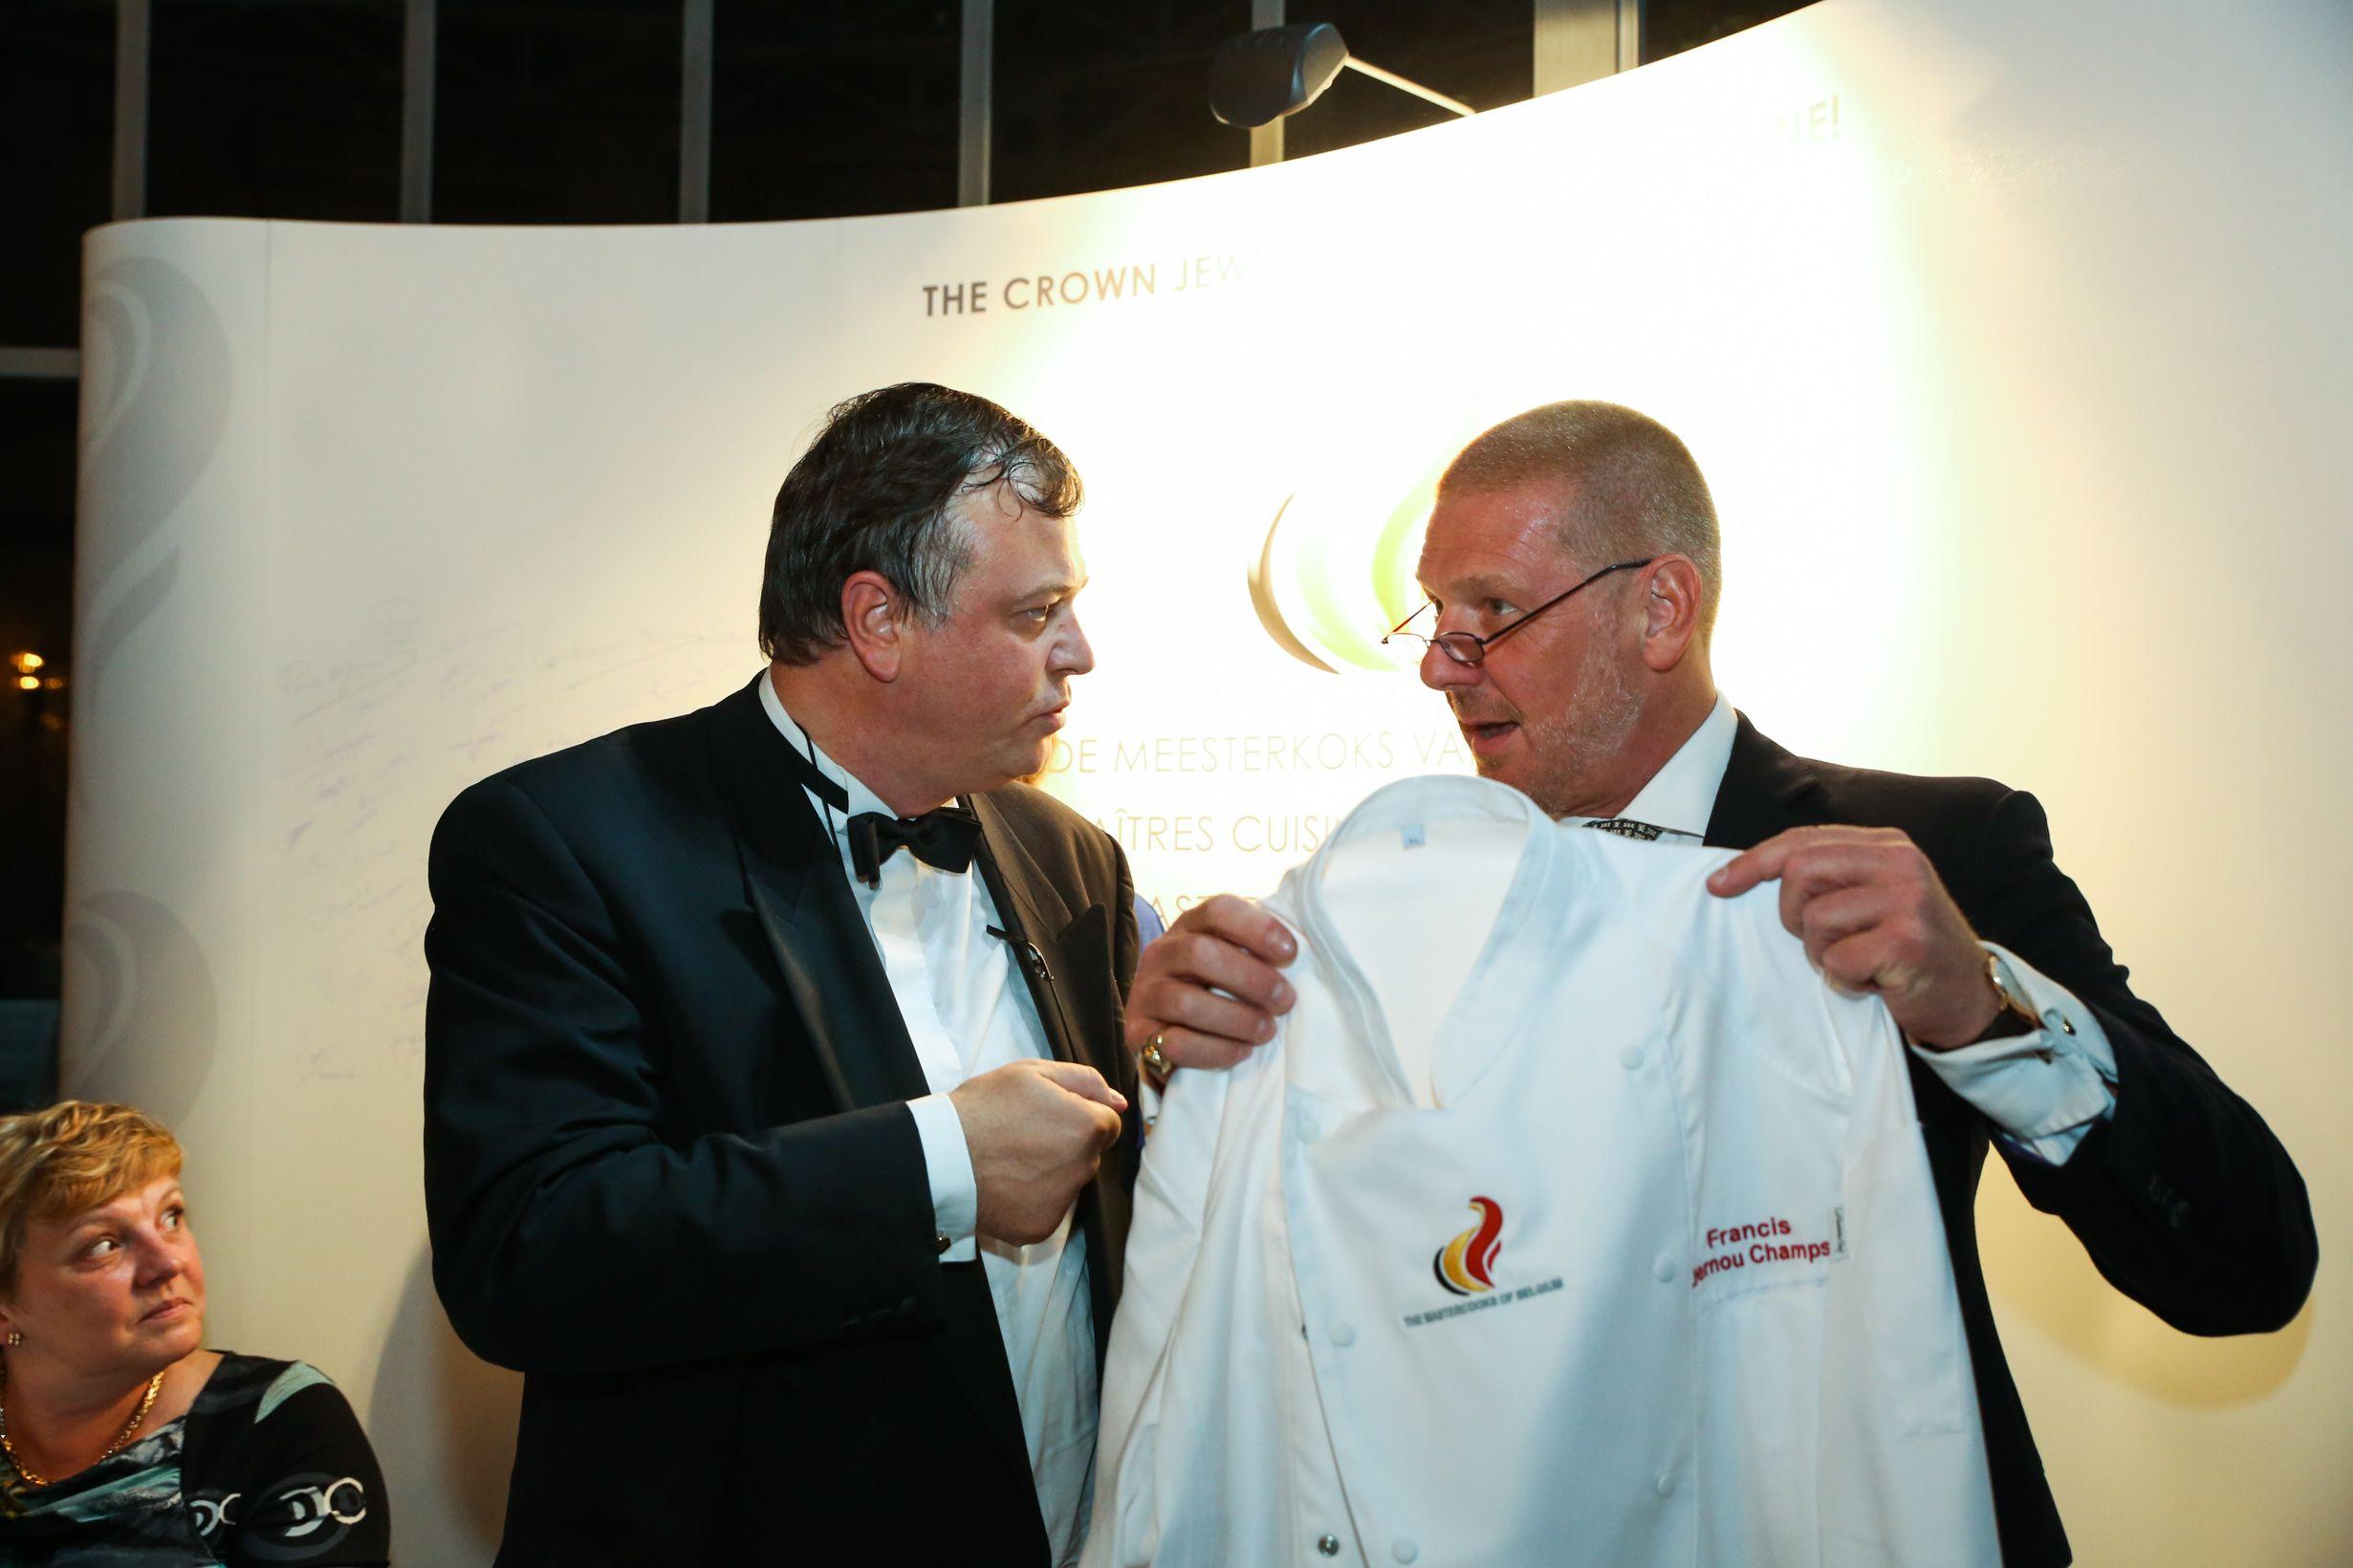 Ambassador Gerald Wathelet with his Mastercook jacket!